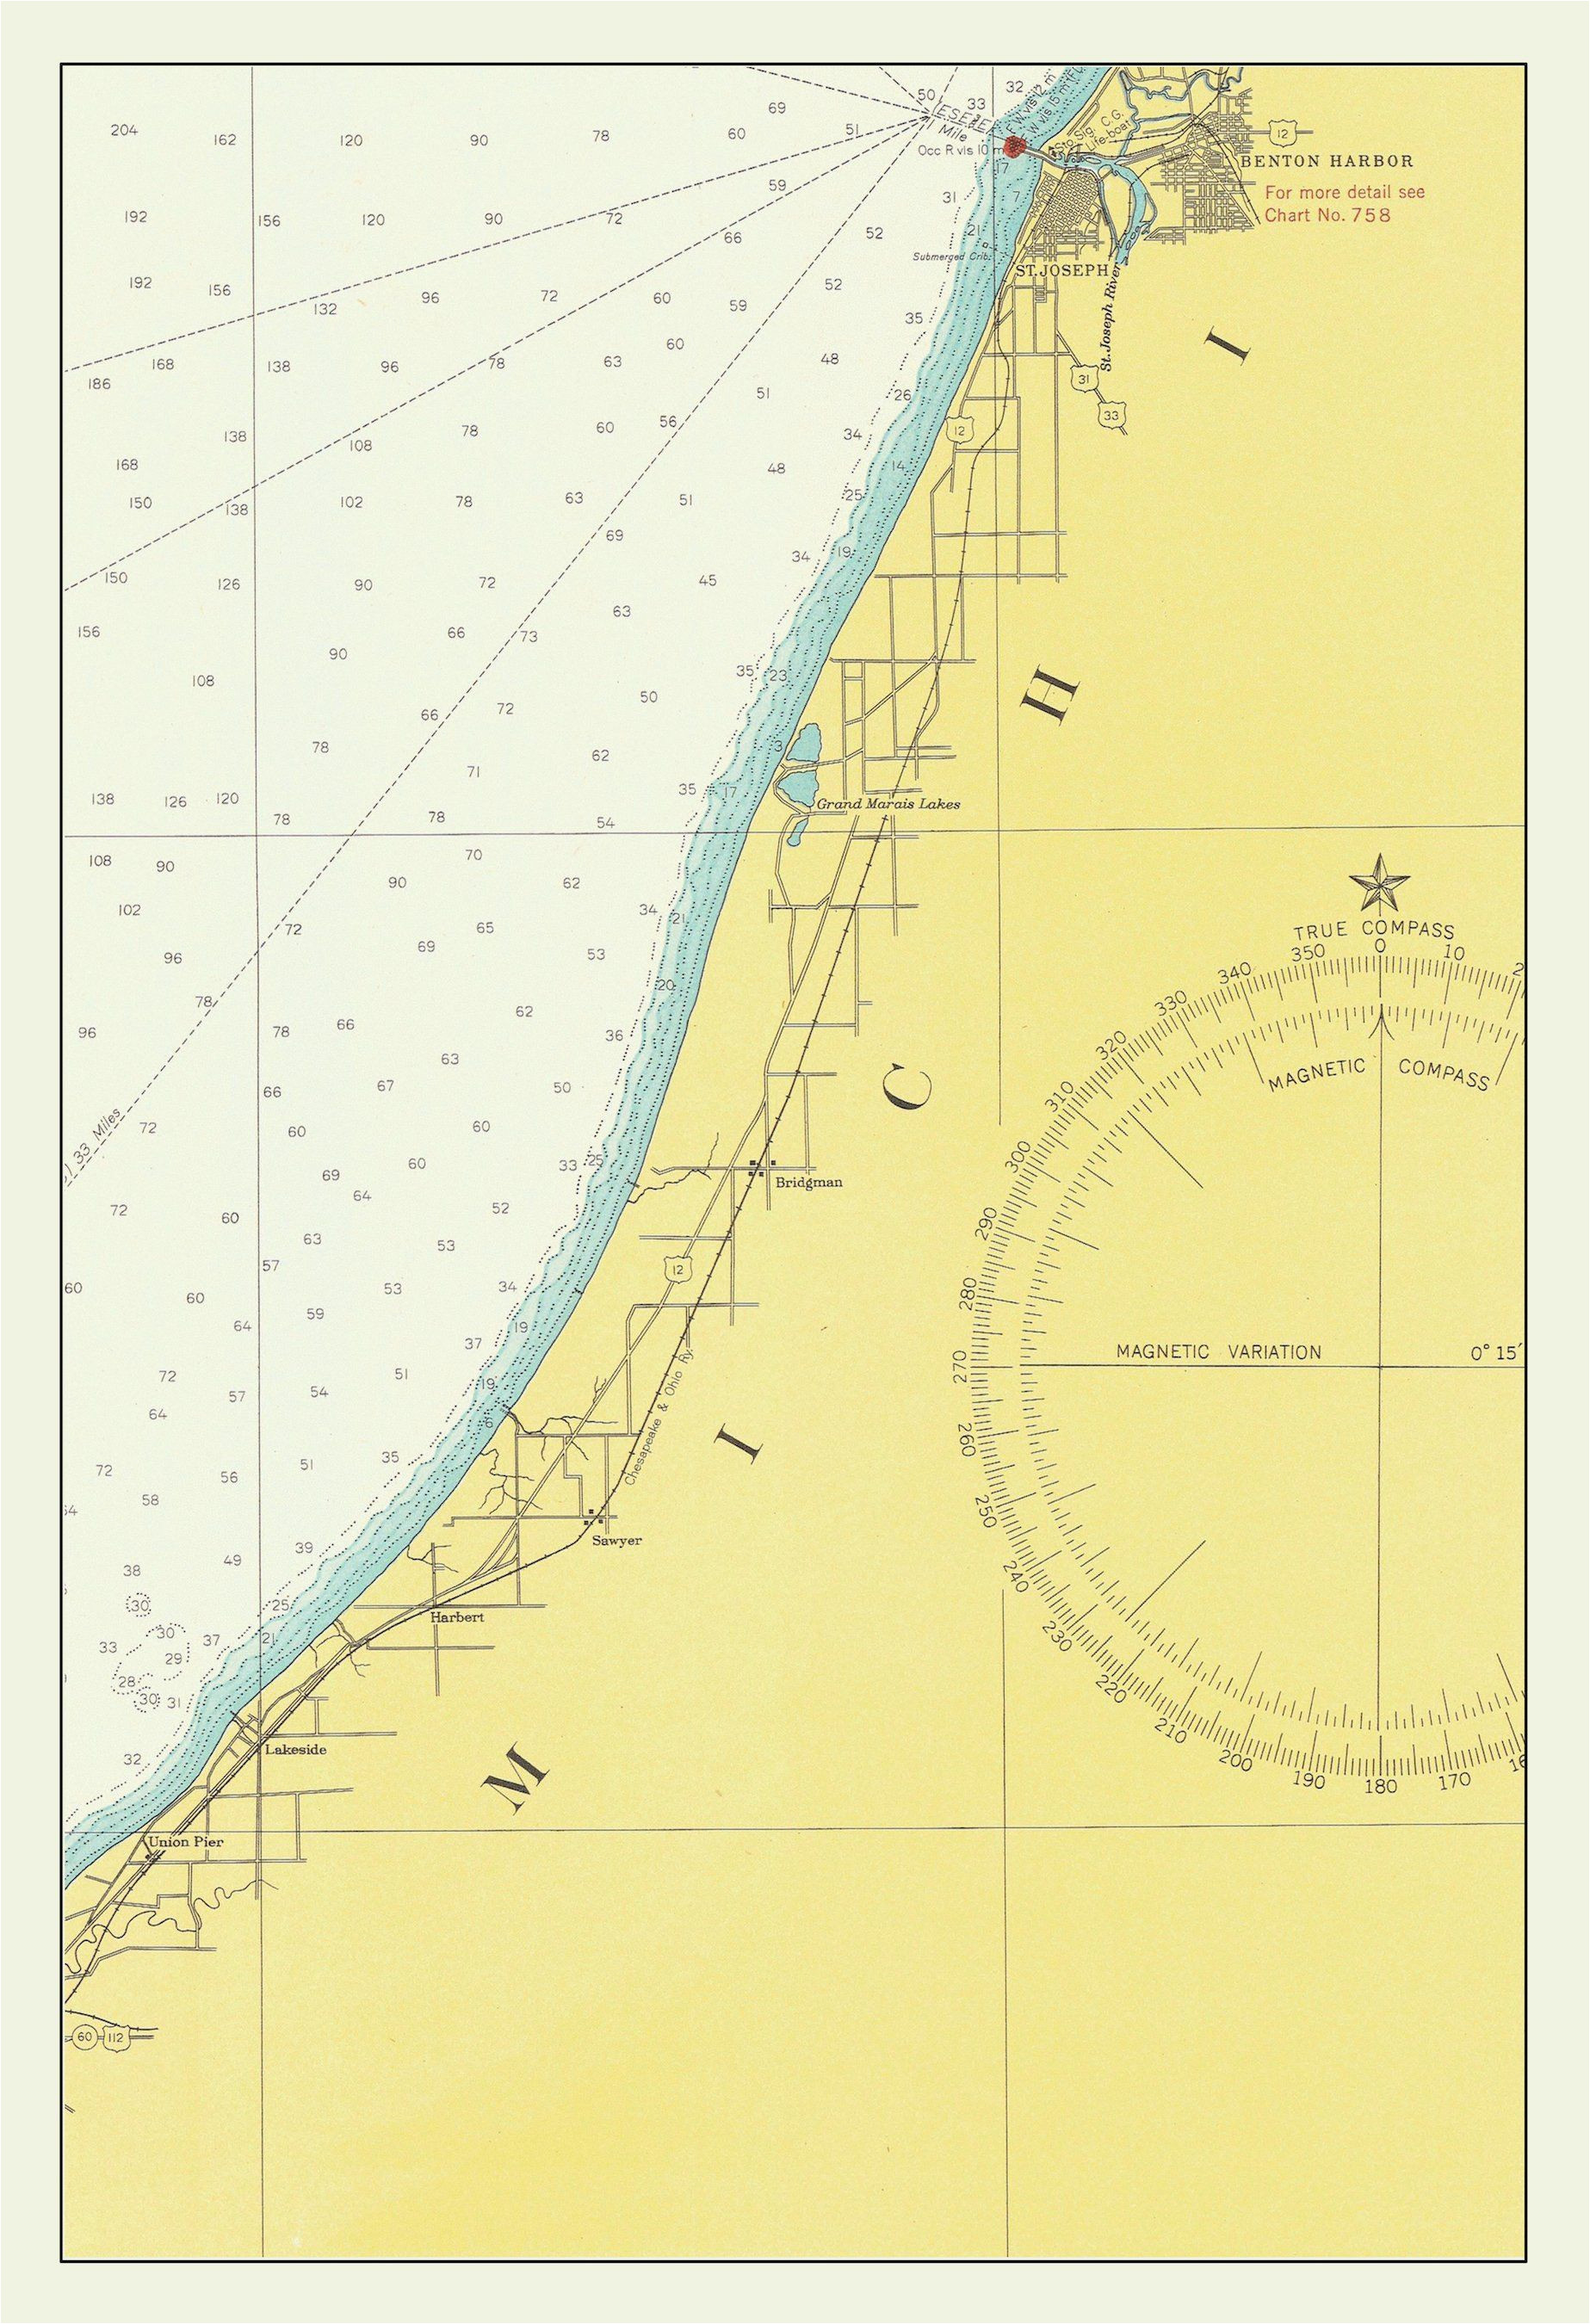 lake michigan map eastern shore benton harbor 1947 products